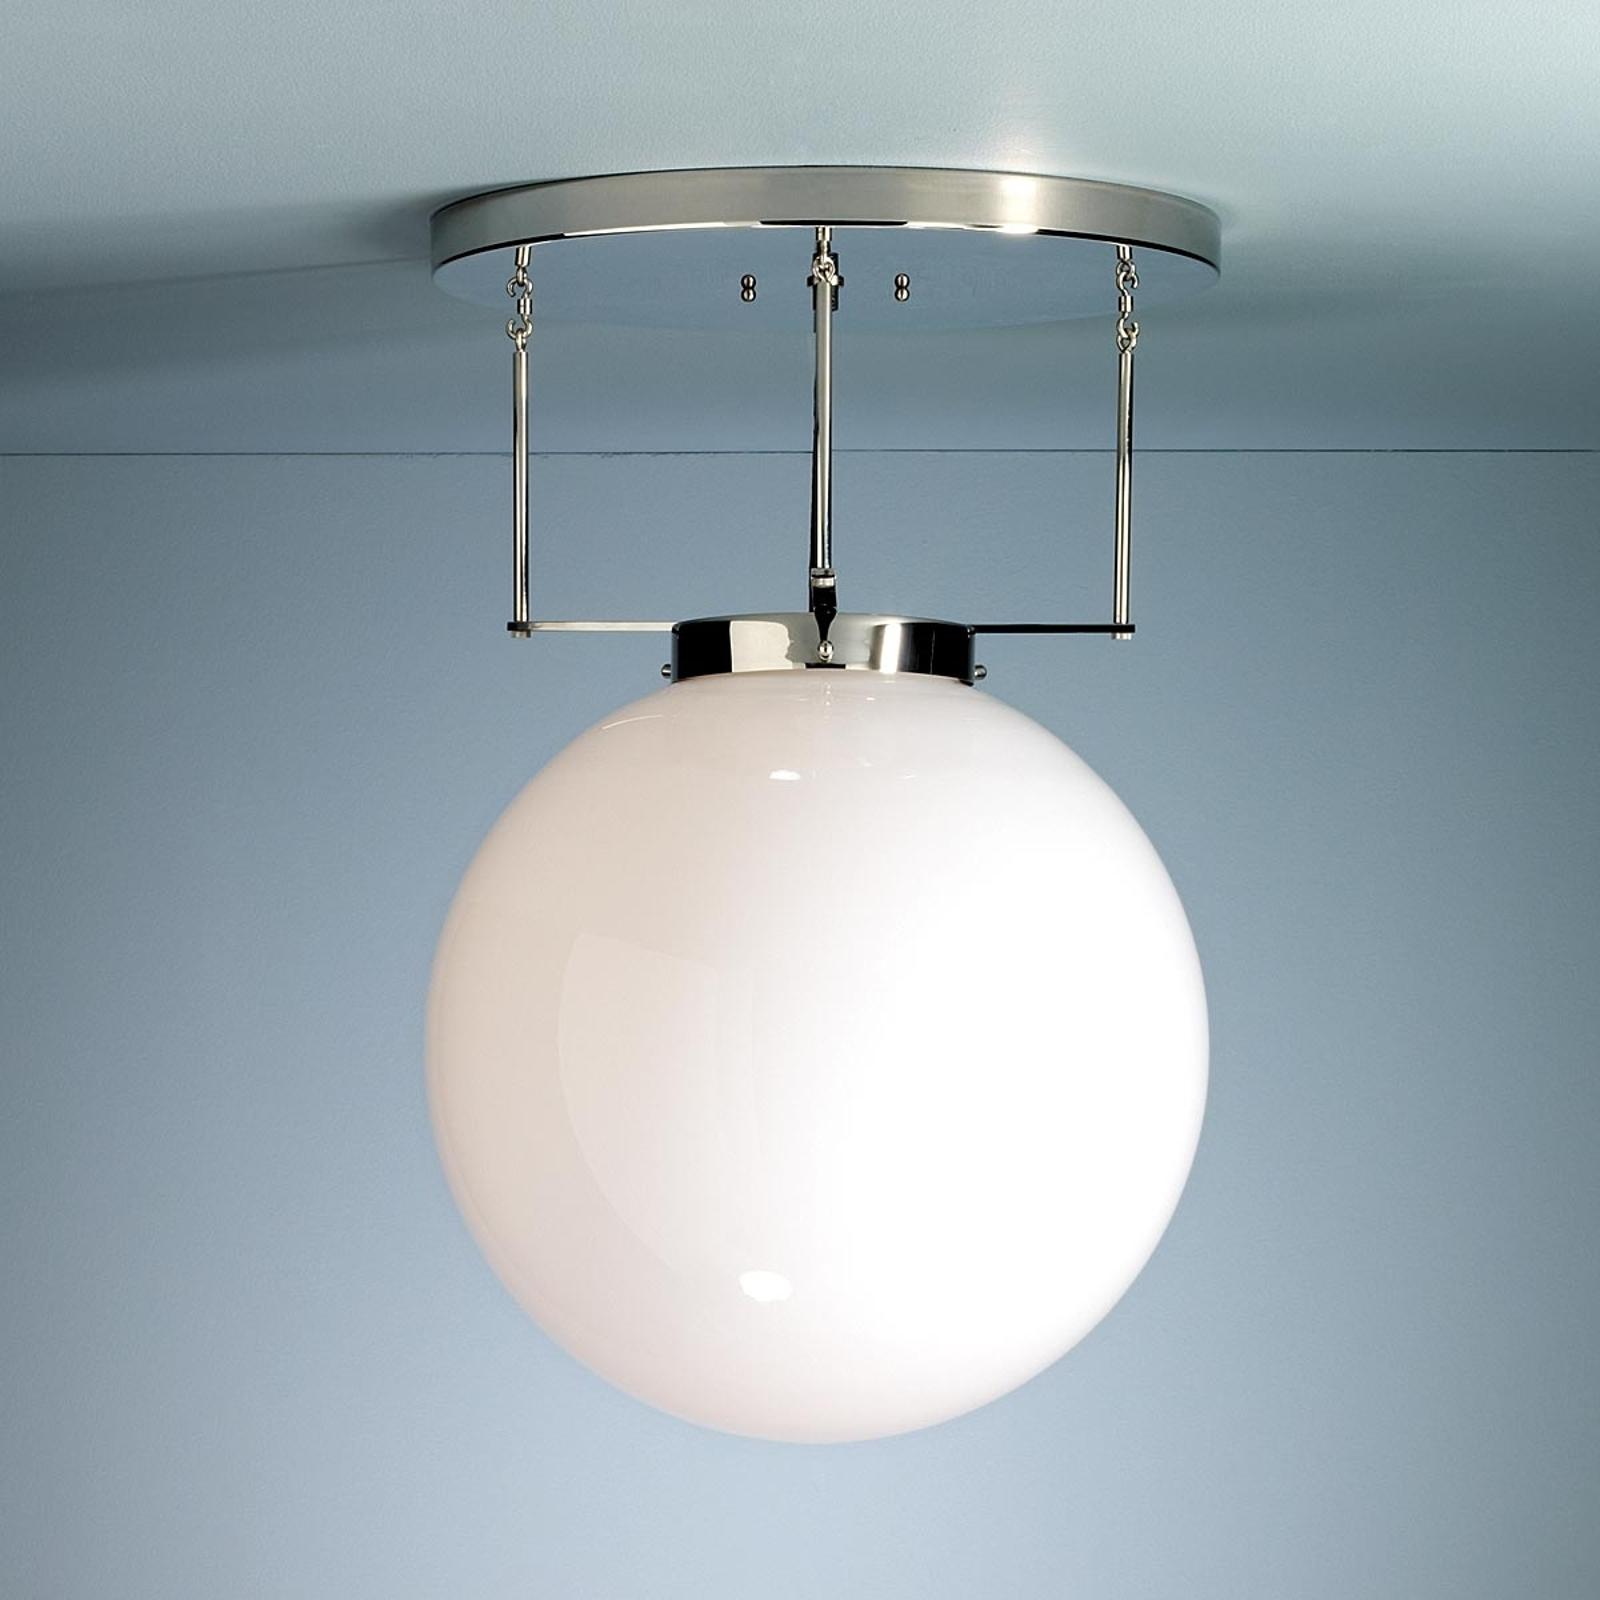 Lampa sufitowa Brandt w stylu Bauhaus 40 cm nikiel